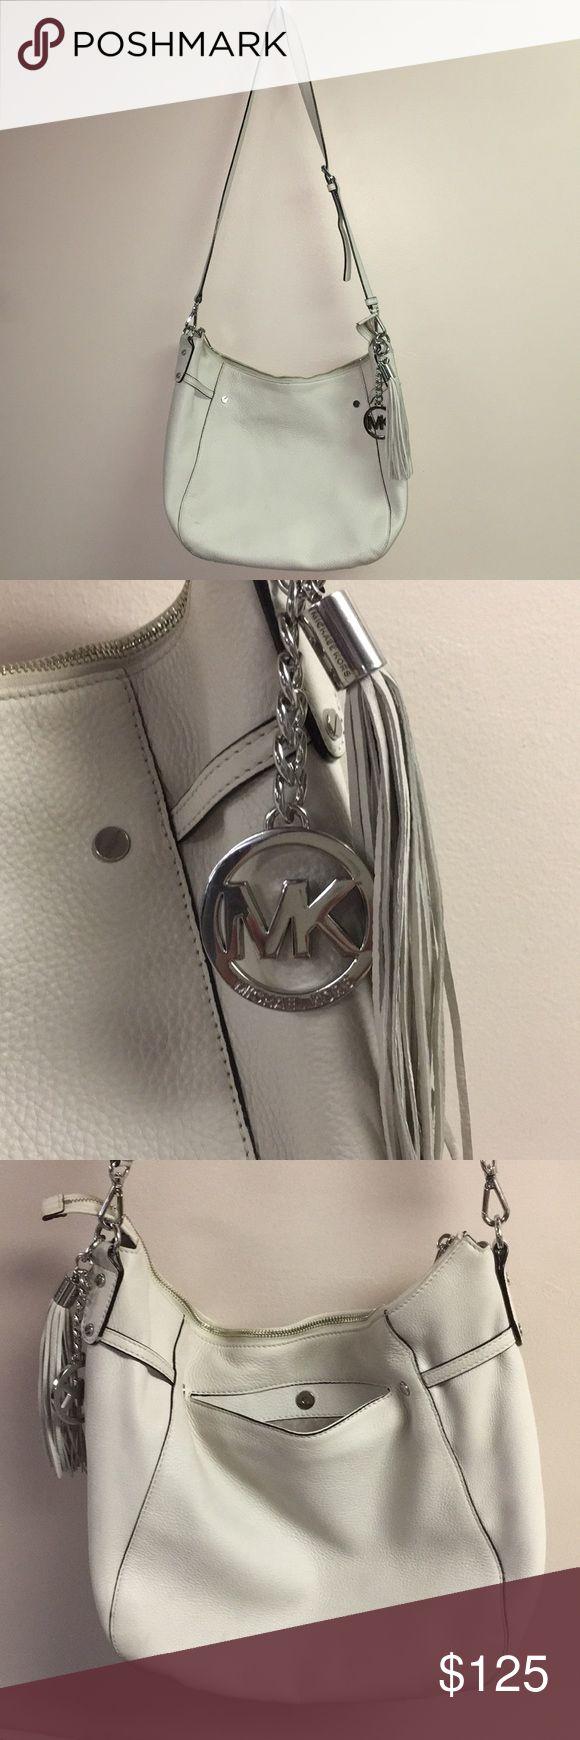 Michael Kors purse Authentic MK Megan vanilla leather & silver shoulder bag. Adjustable strap. Gently used. Michael Kors Bags Shoulder Bags